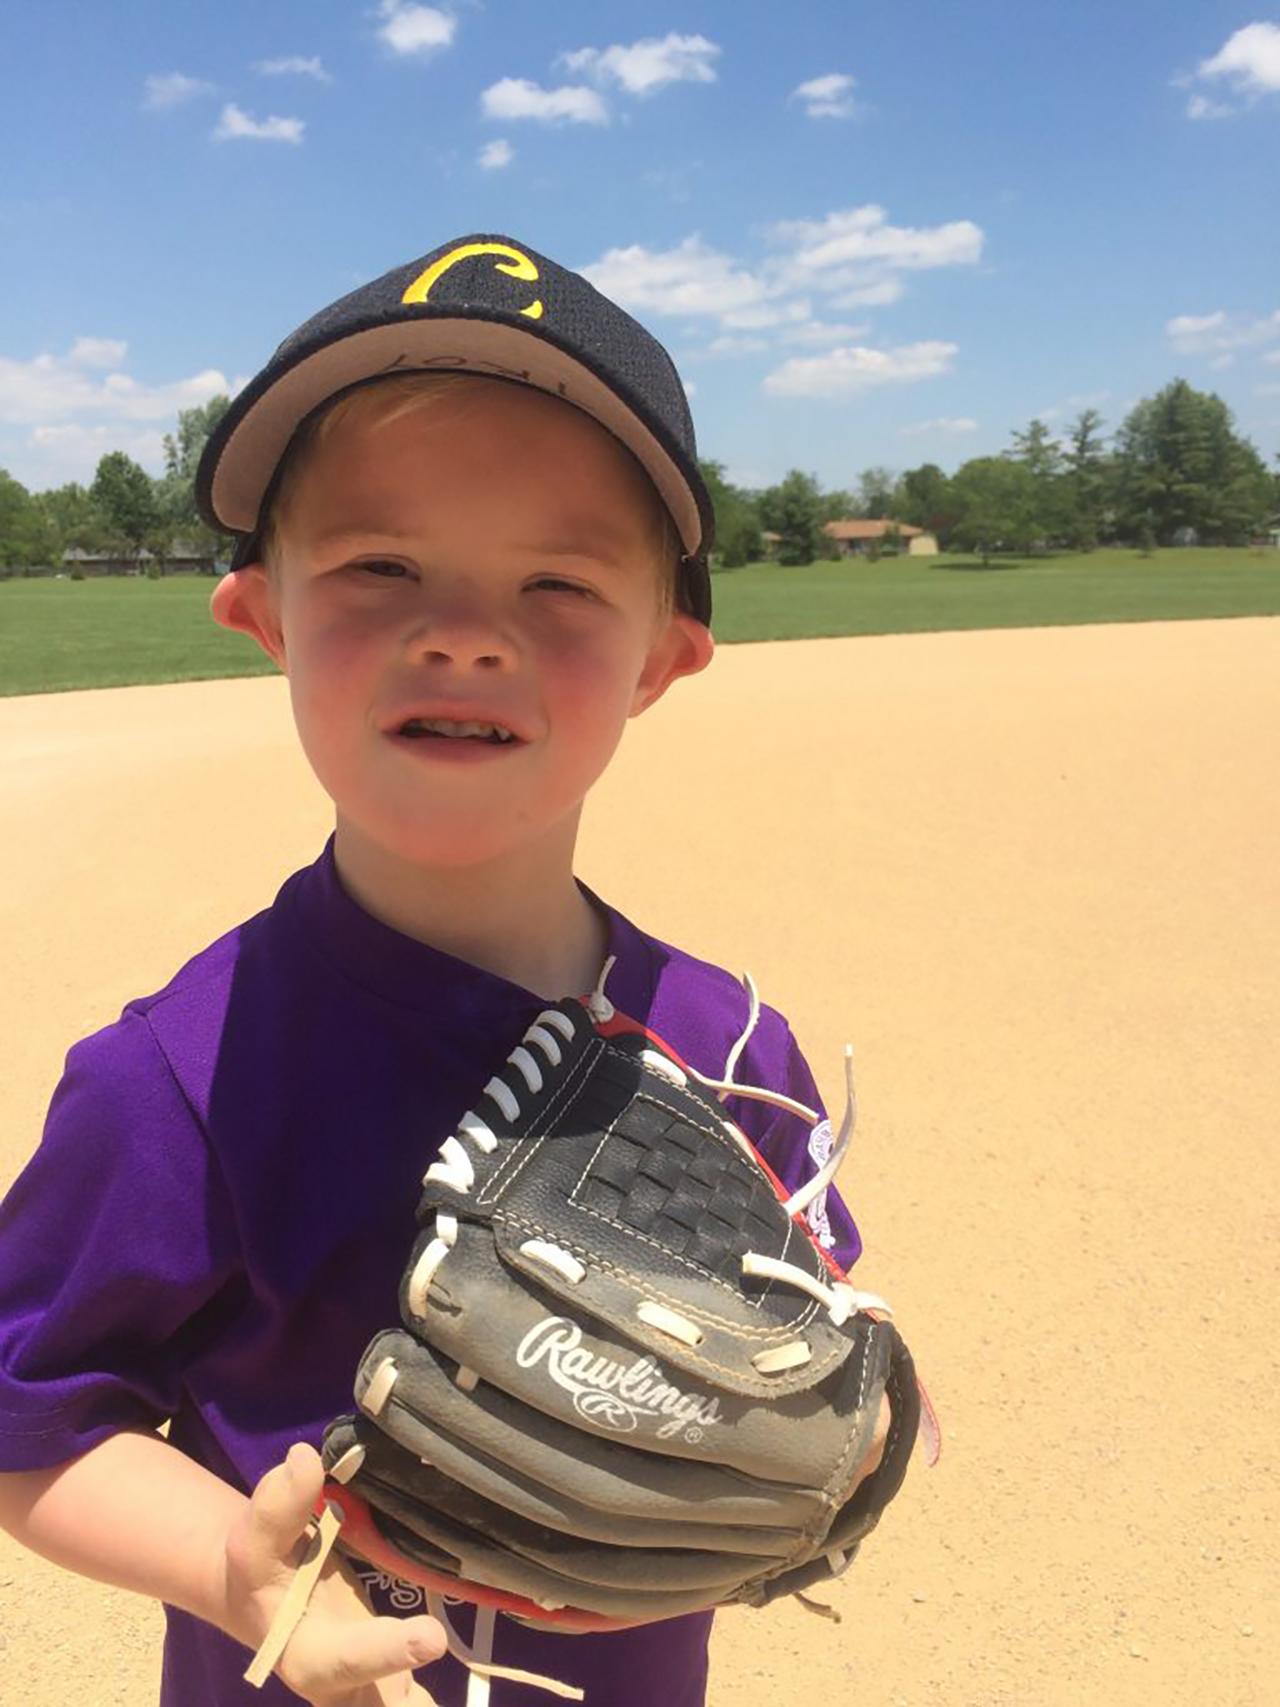 Troy on the ballfield.